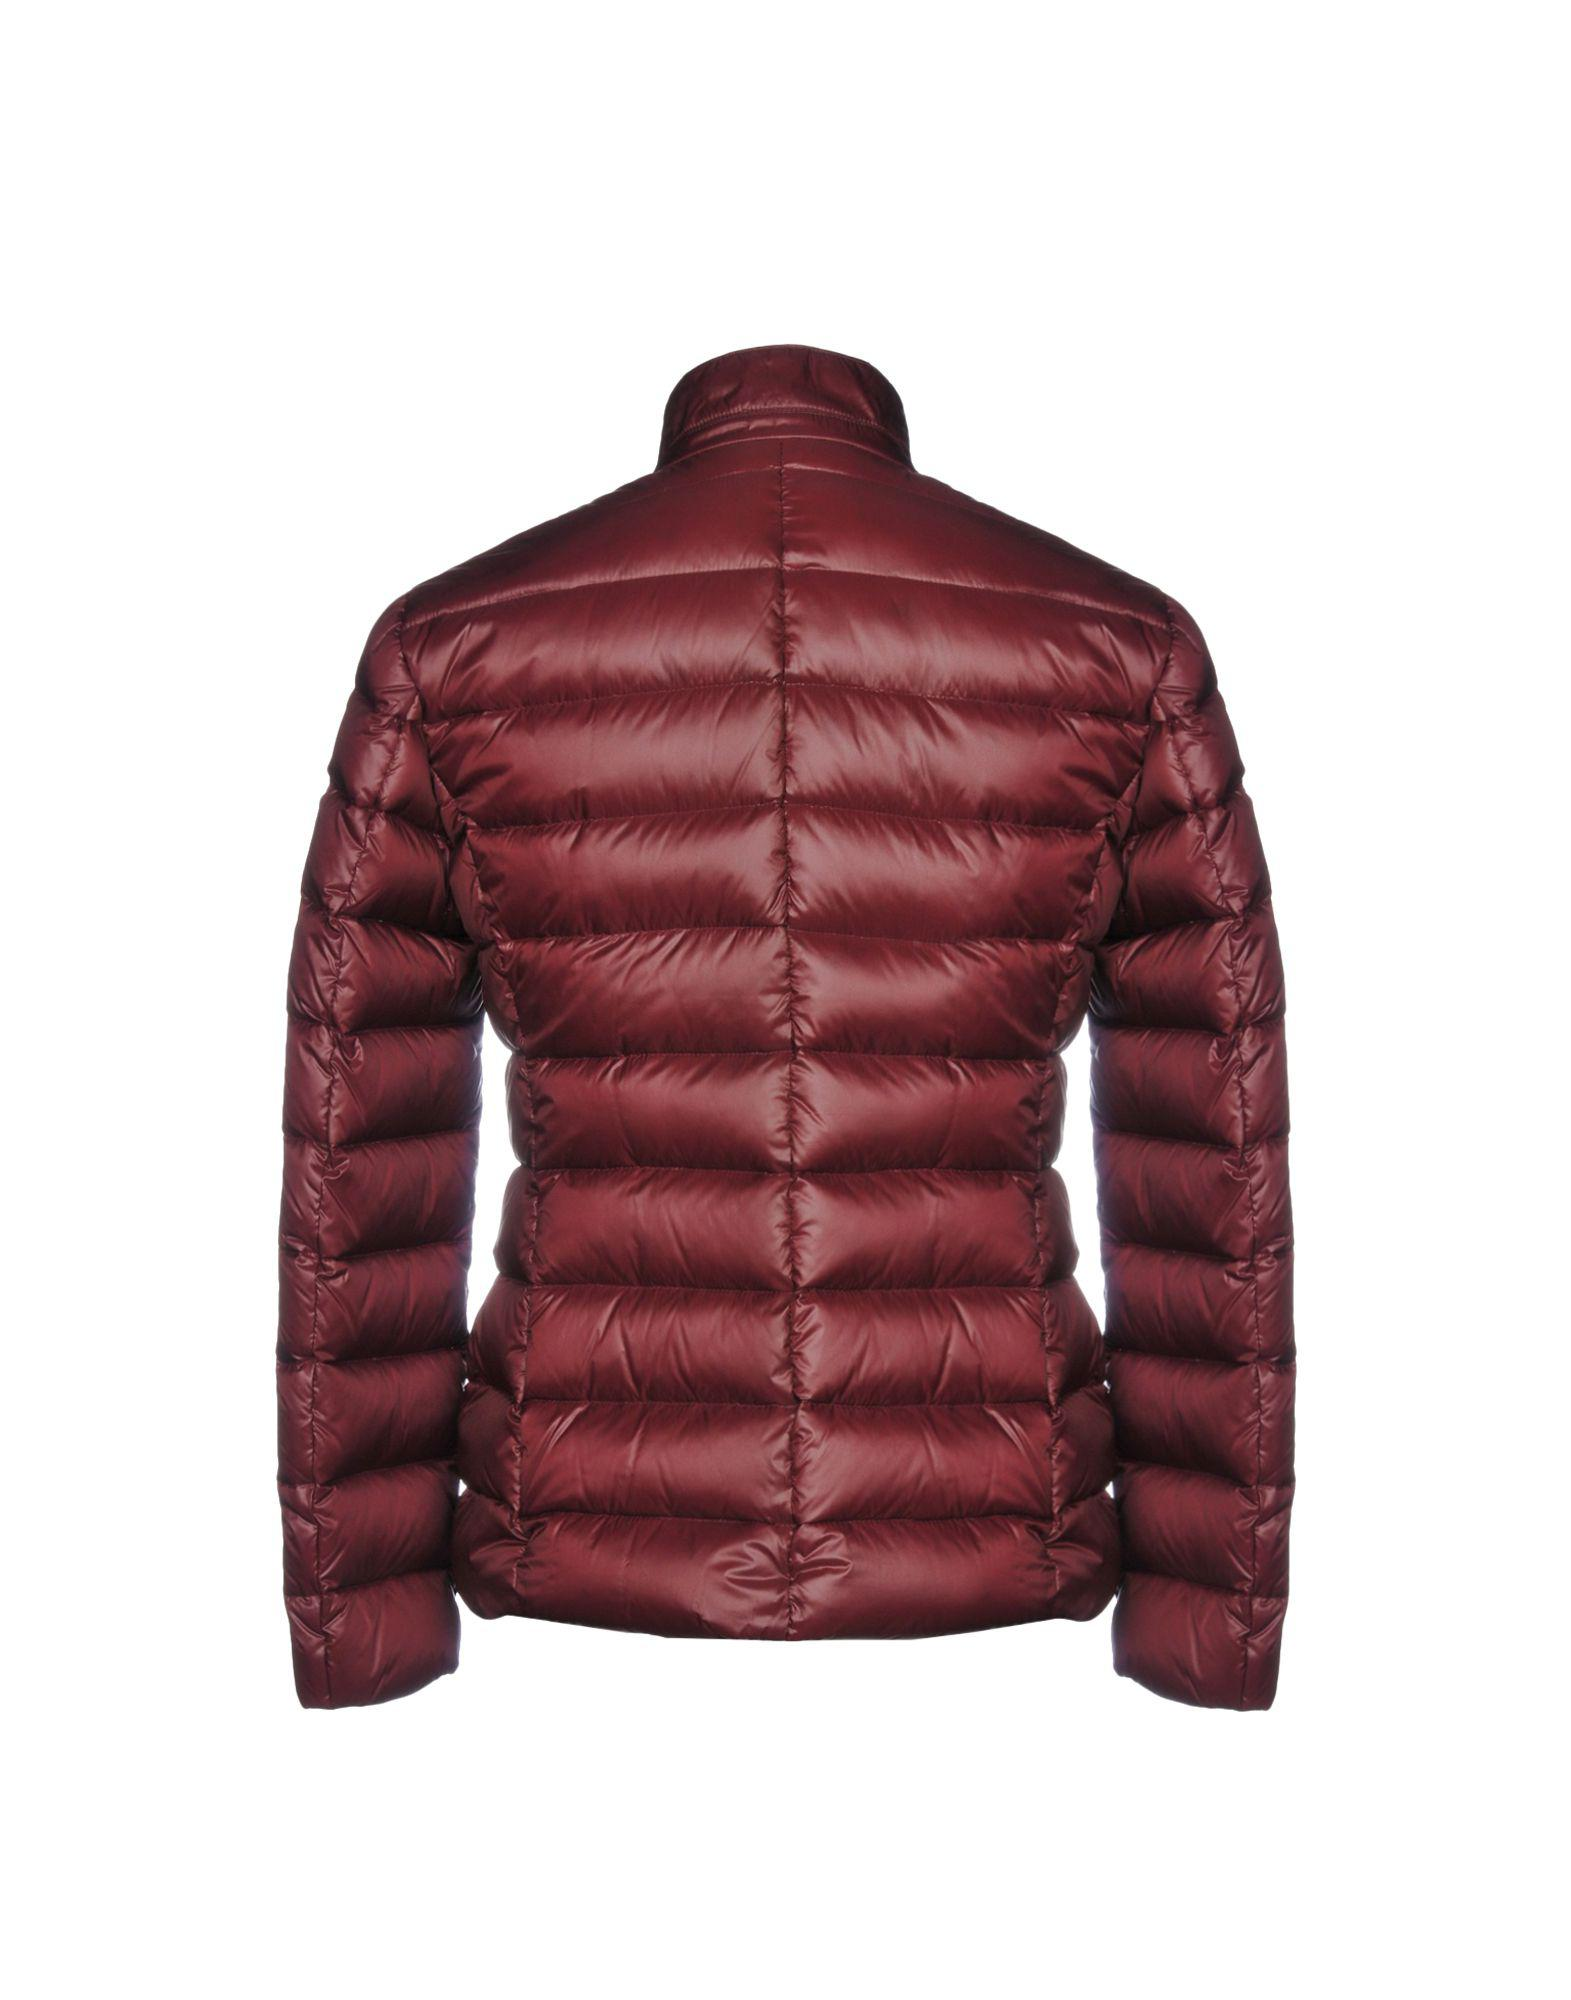 Domenico Tagliente Goose Down Jacket in Maroon (Red) for Men